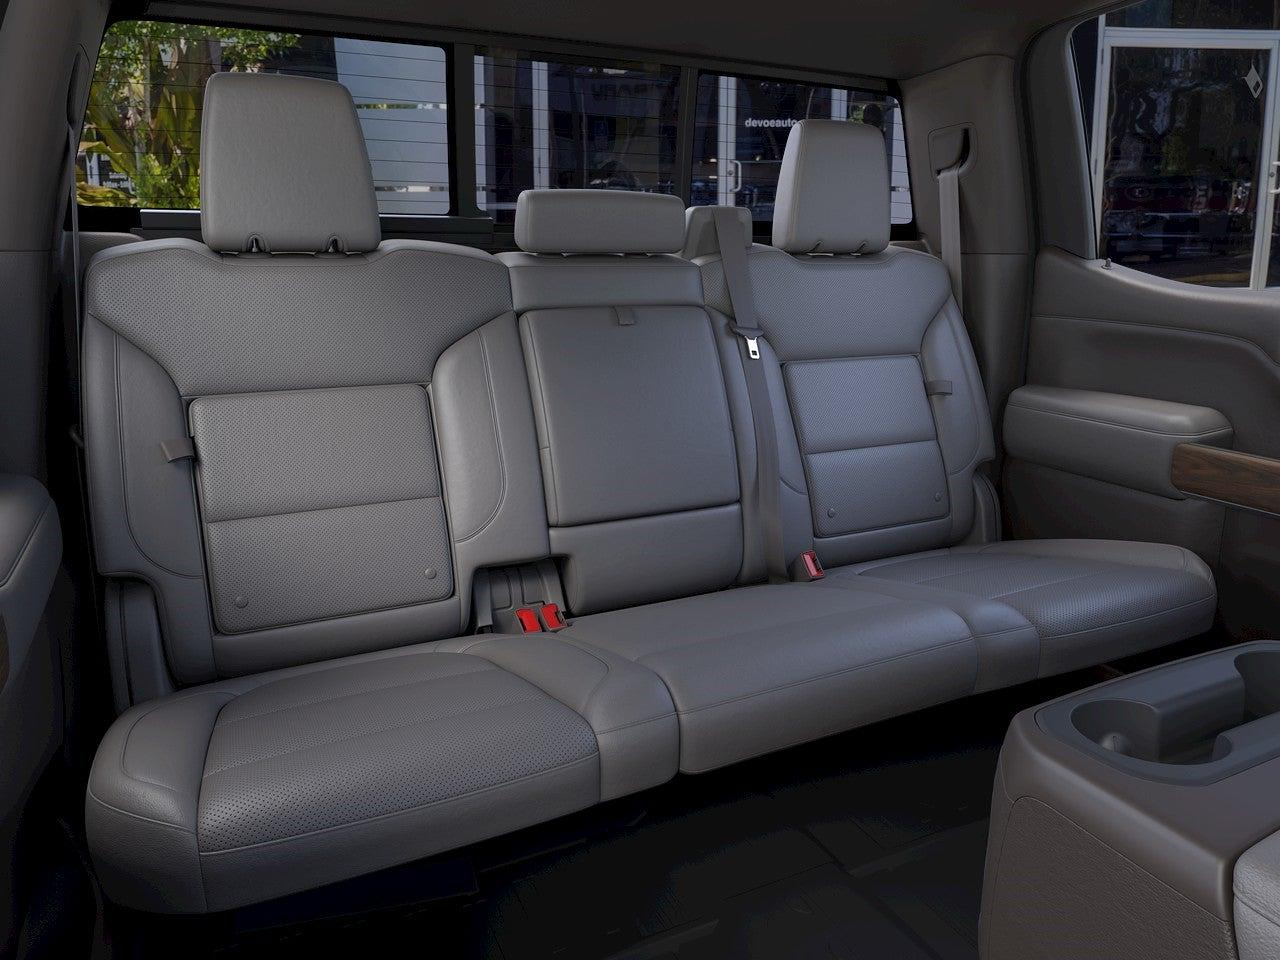 2021 GMC Sierra 1500 Crew Cab 4x4, Pickup #T21447 - photo 34